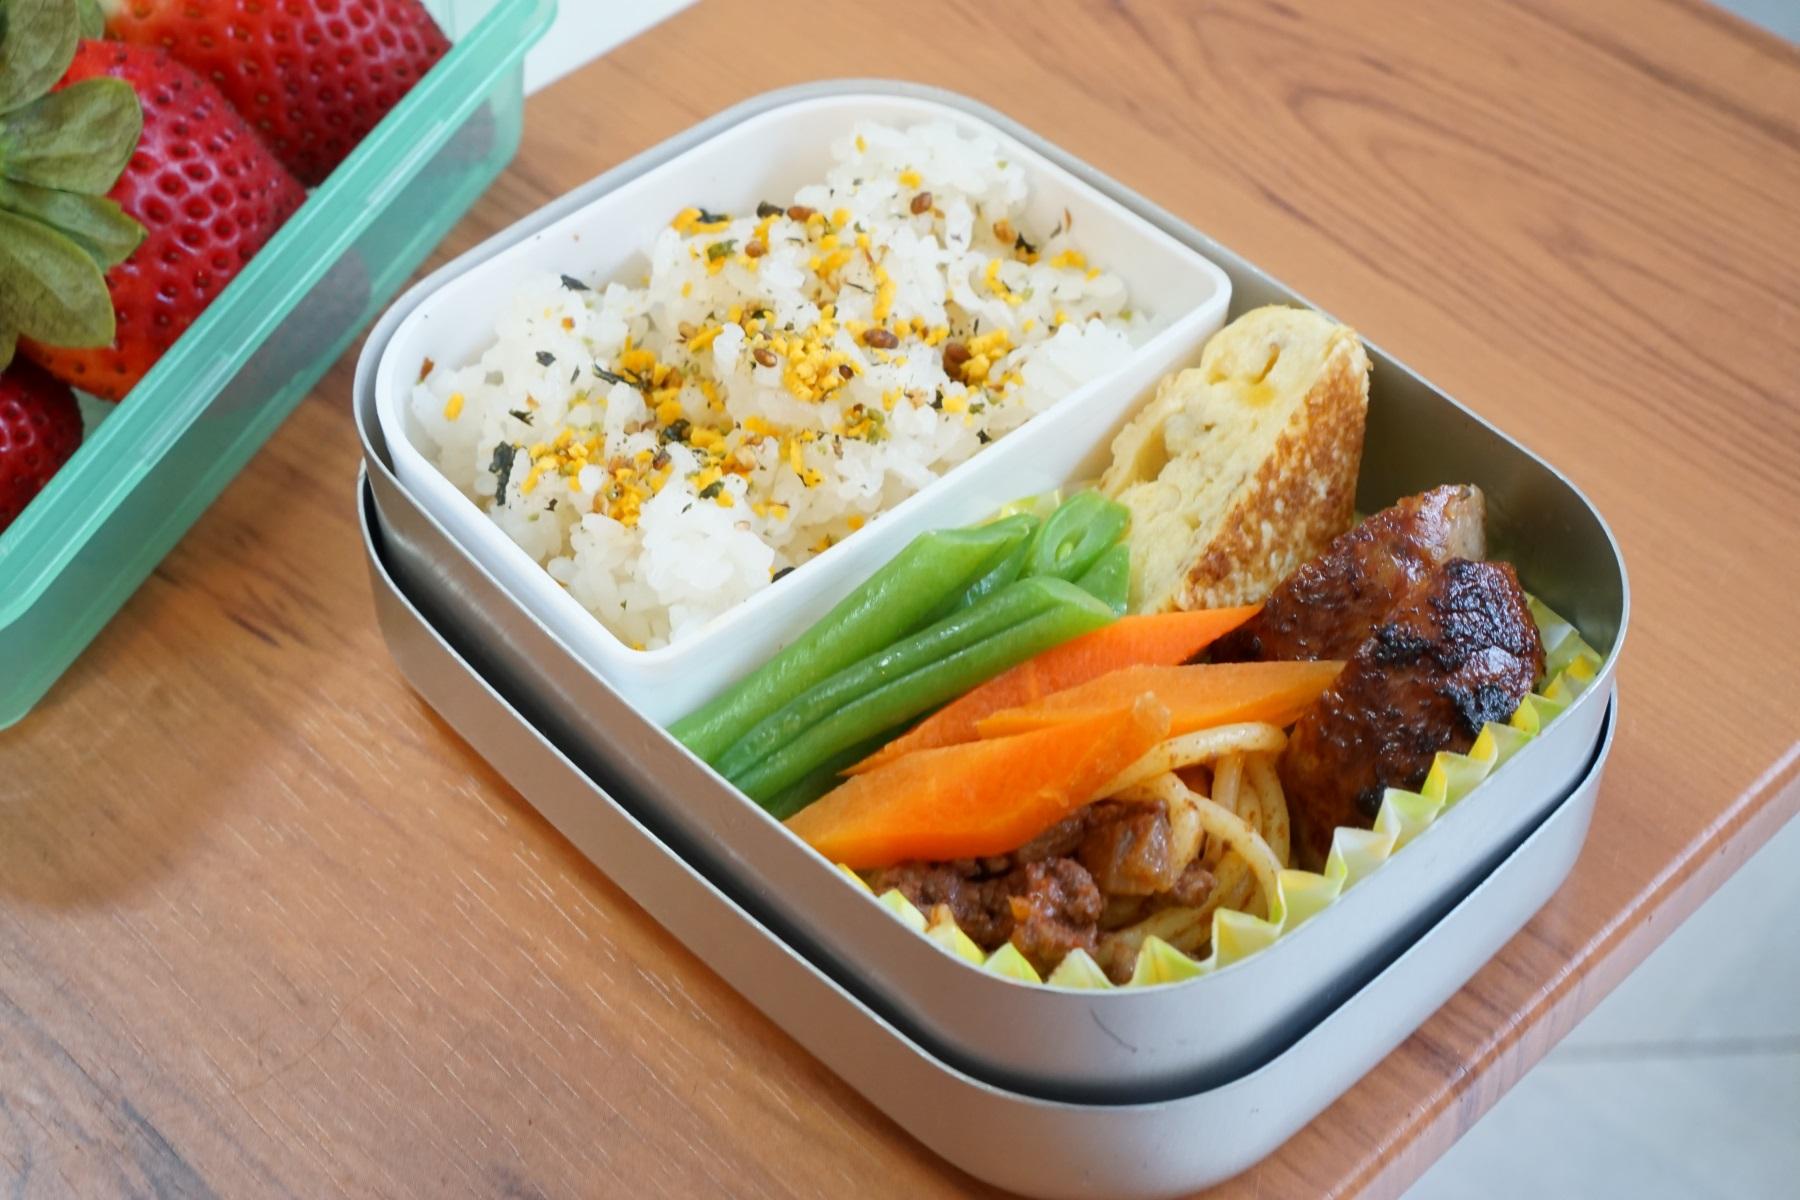 lunchboxidea6.jpg